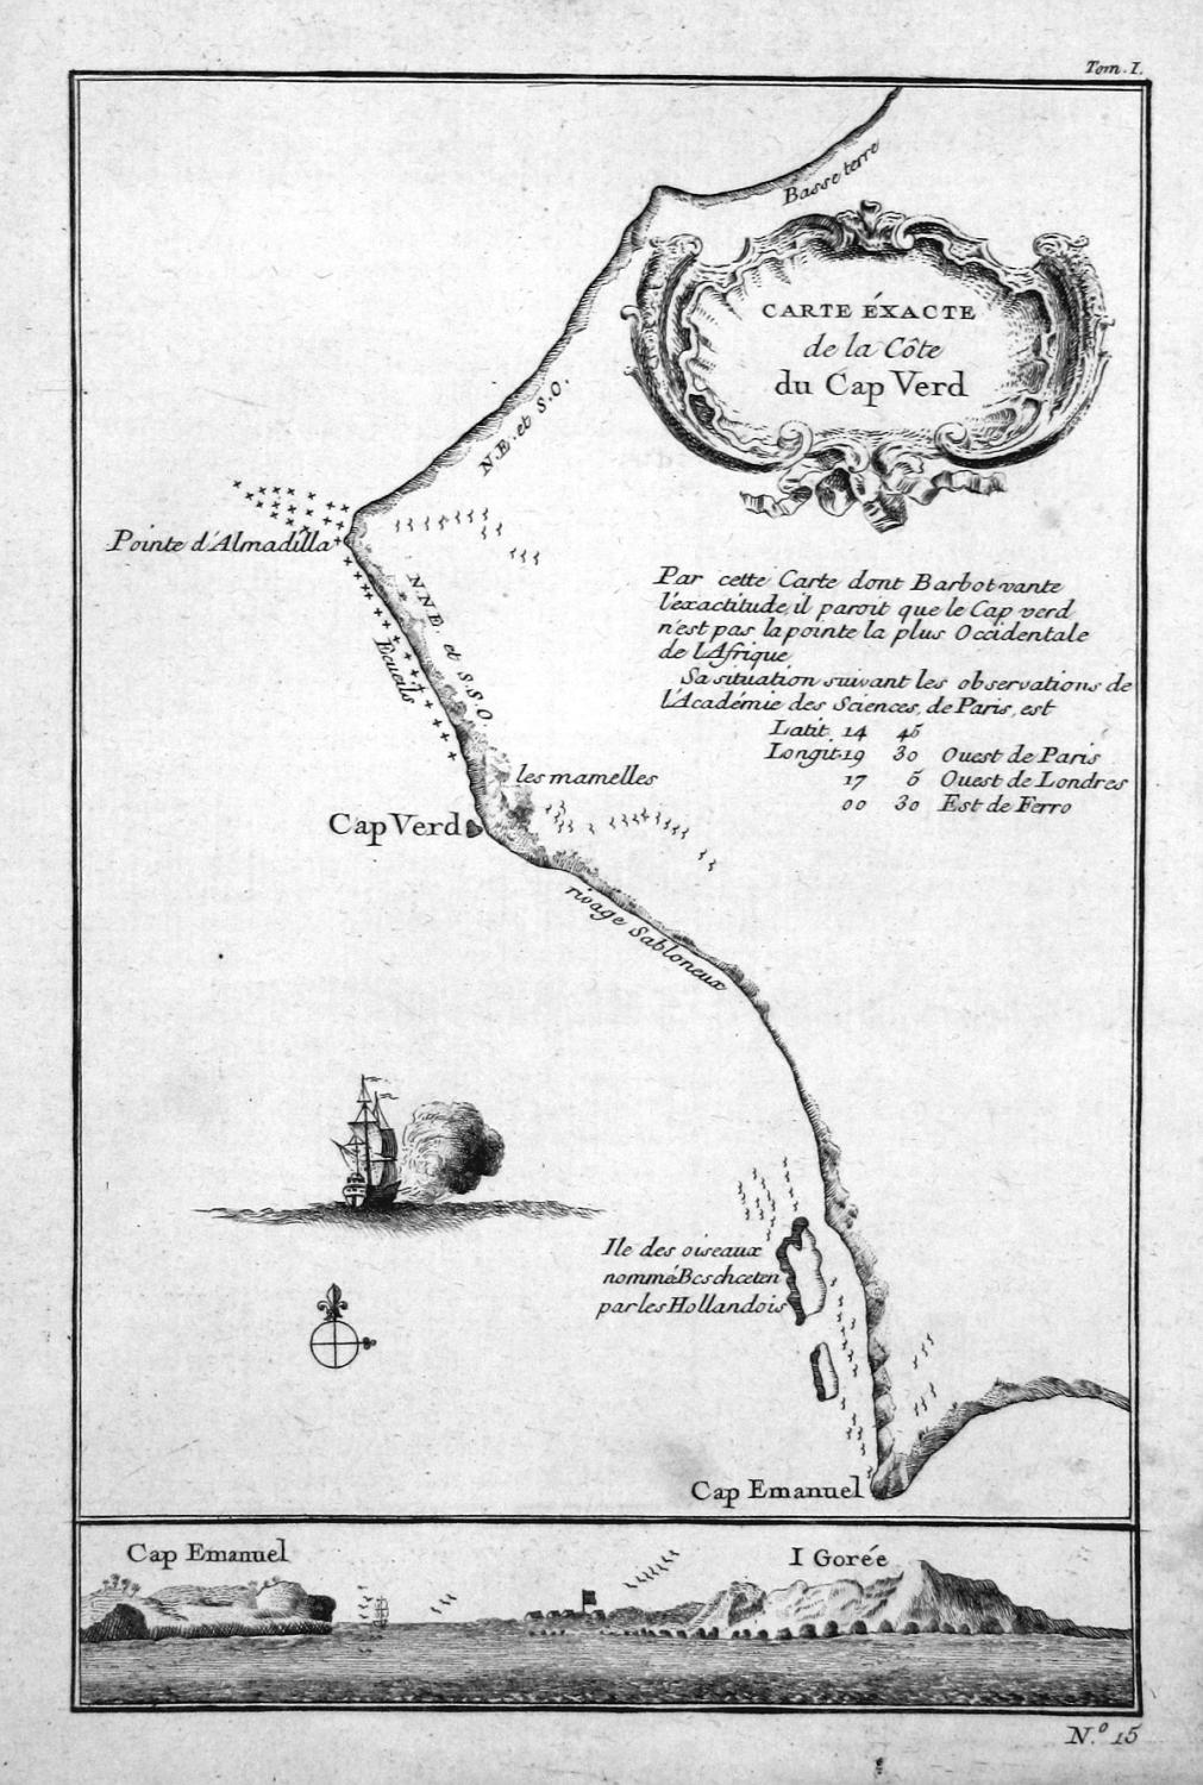 Carte exacte de la Cote du Cap: Bellin, Jacques-Nicolas: